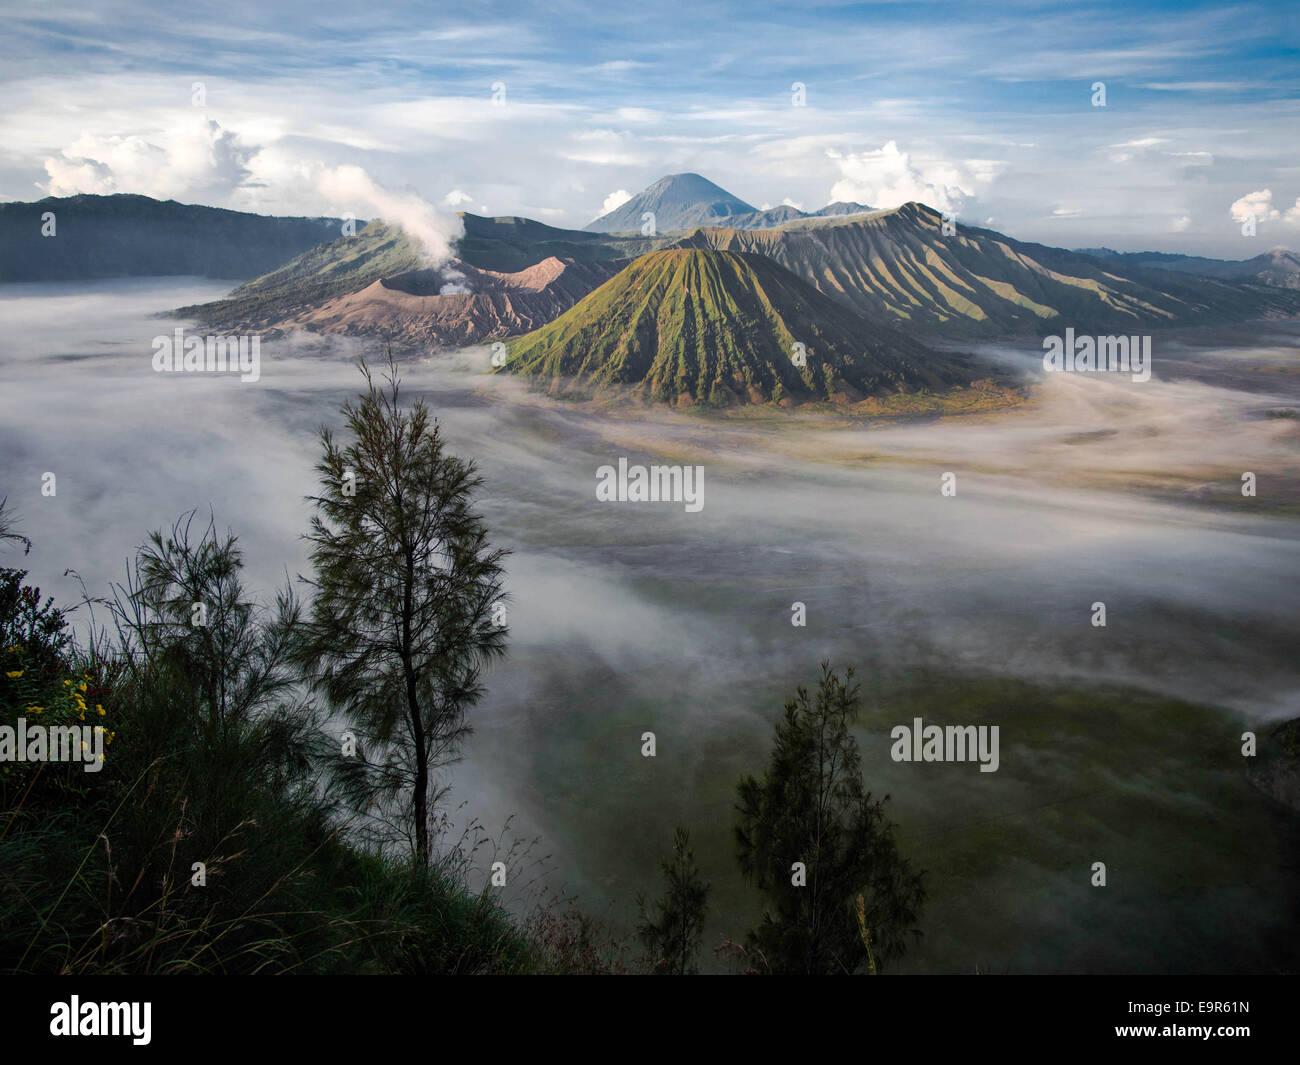 Mount Bromo, Gunung Semeru and Mount Batok, Central Java, Indonesia. - Stock Image